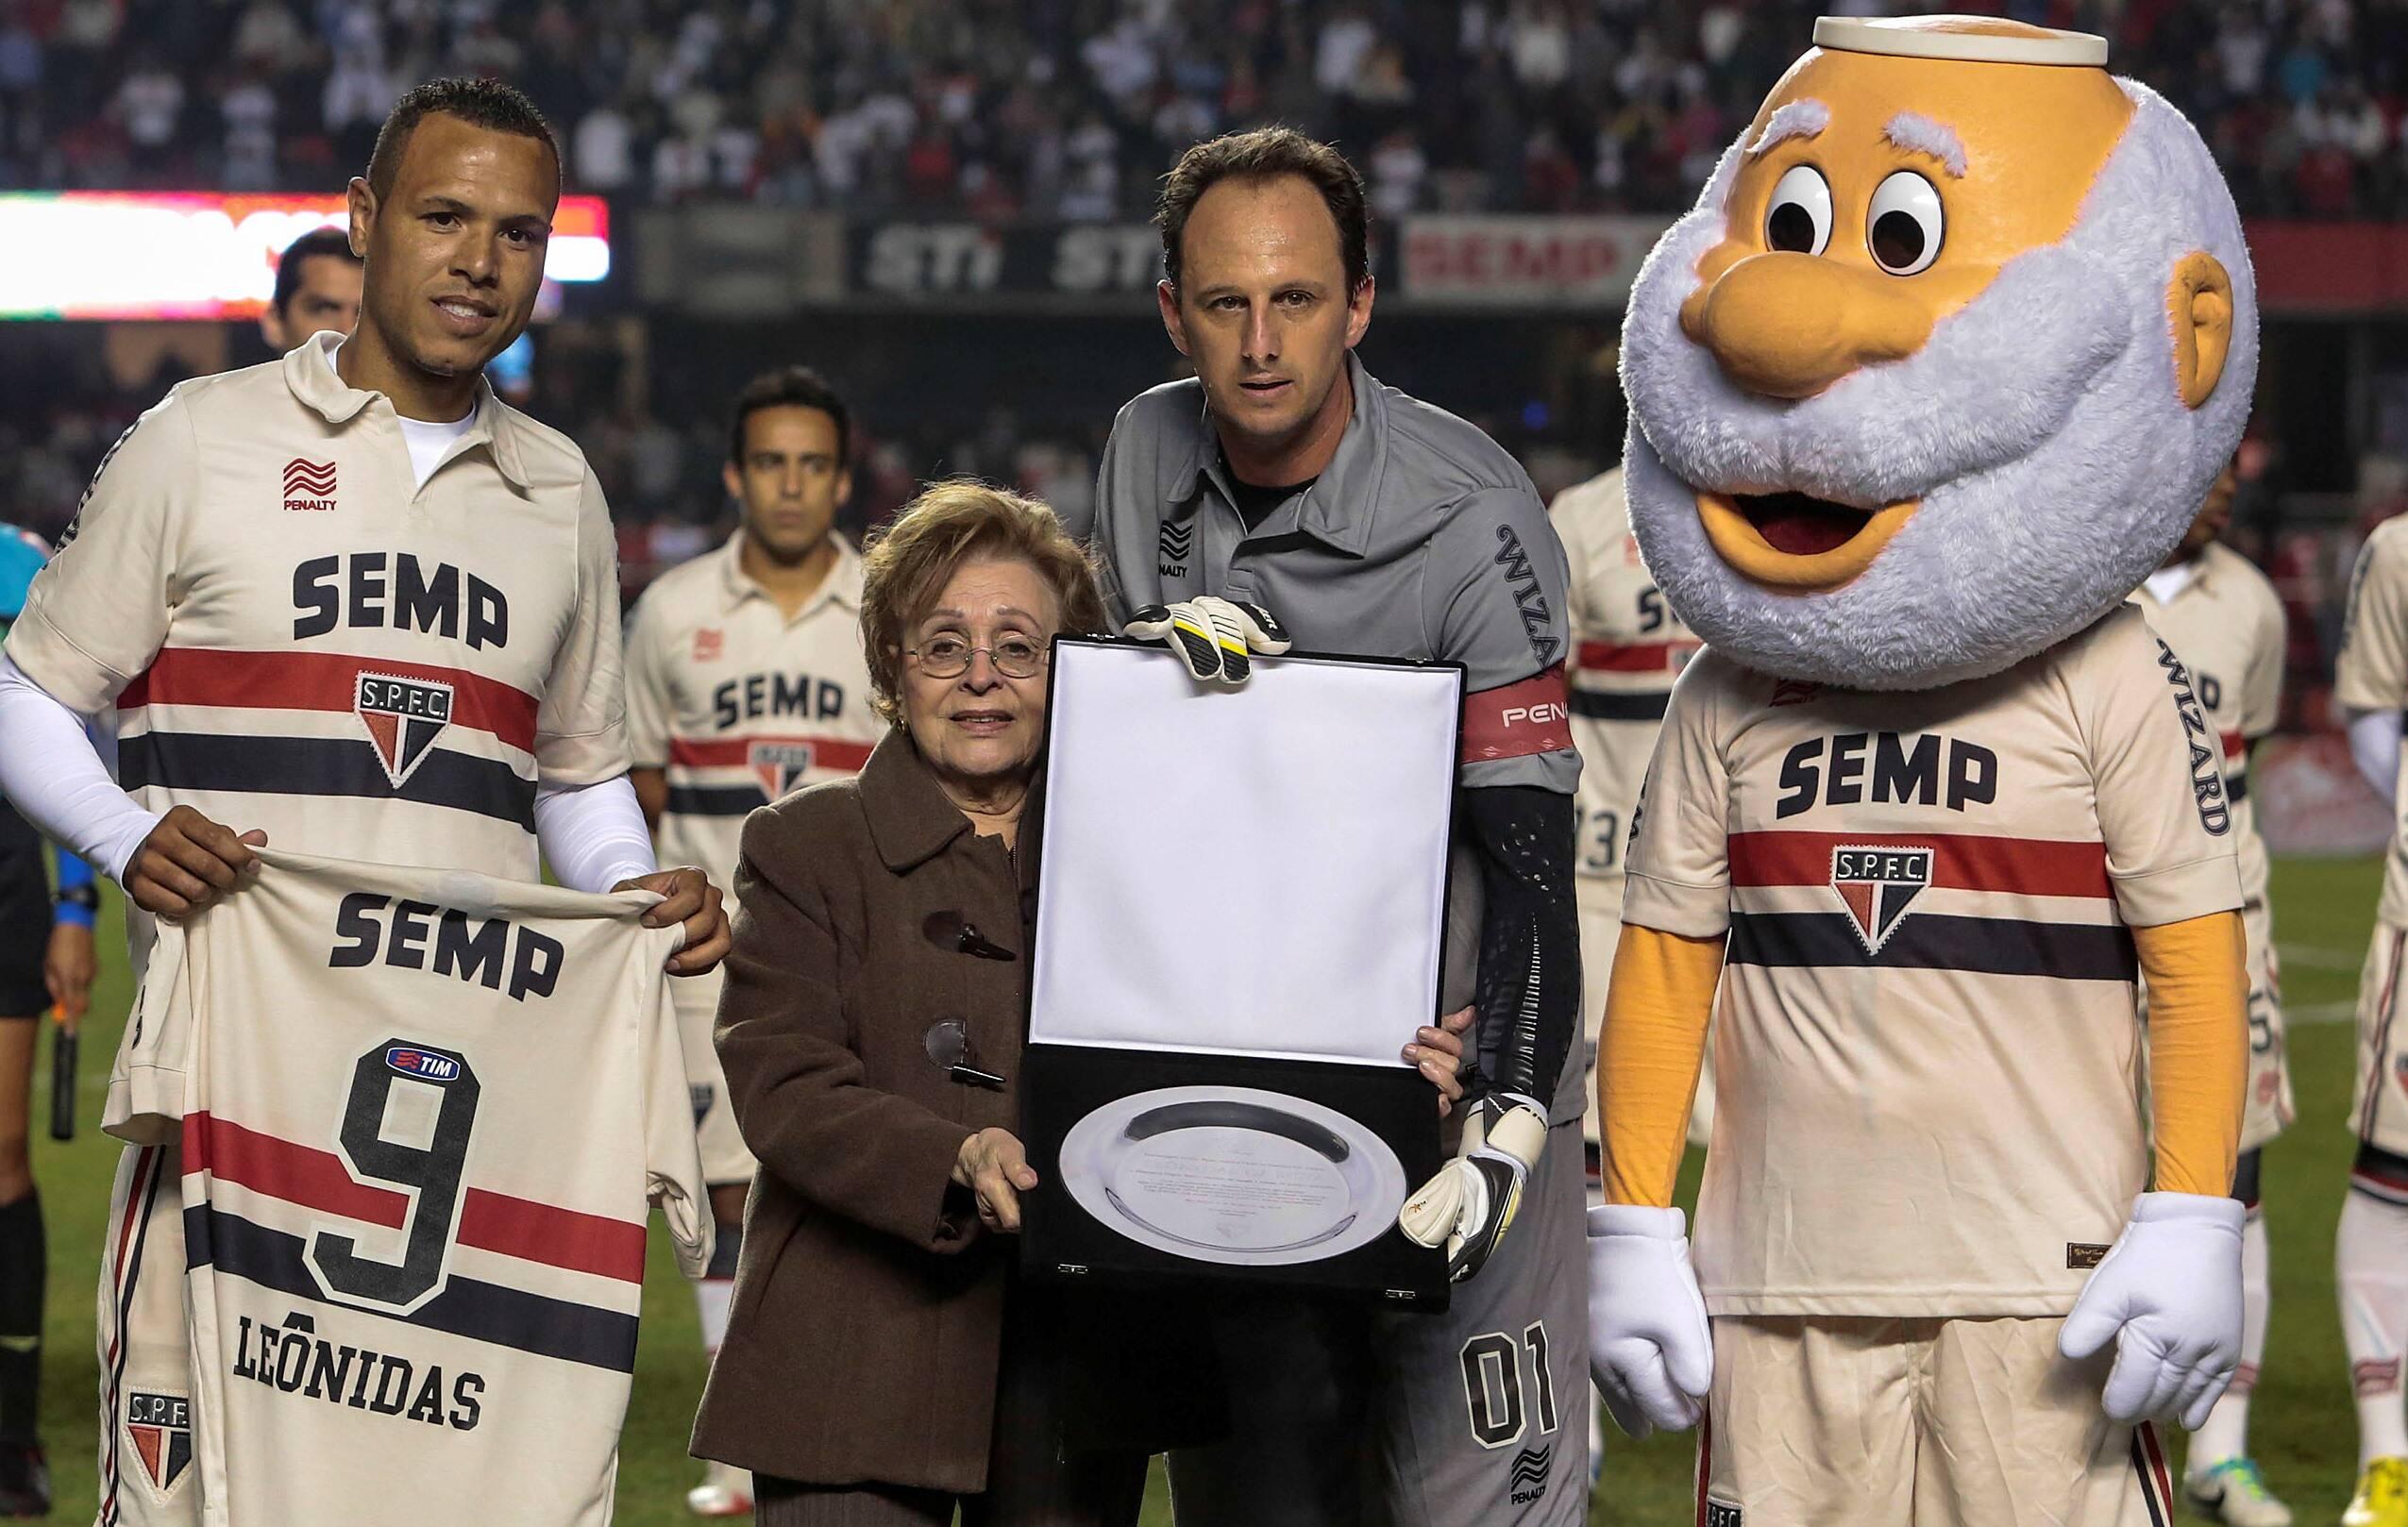 Foto: MIGUEL SCHINCARIOL / Gazeta Press